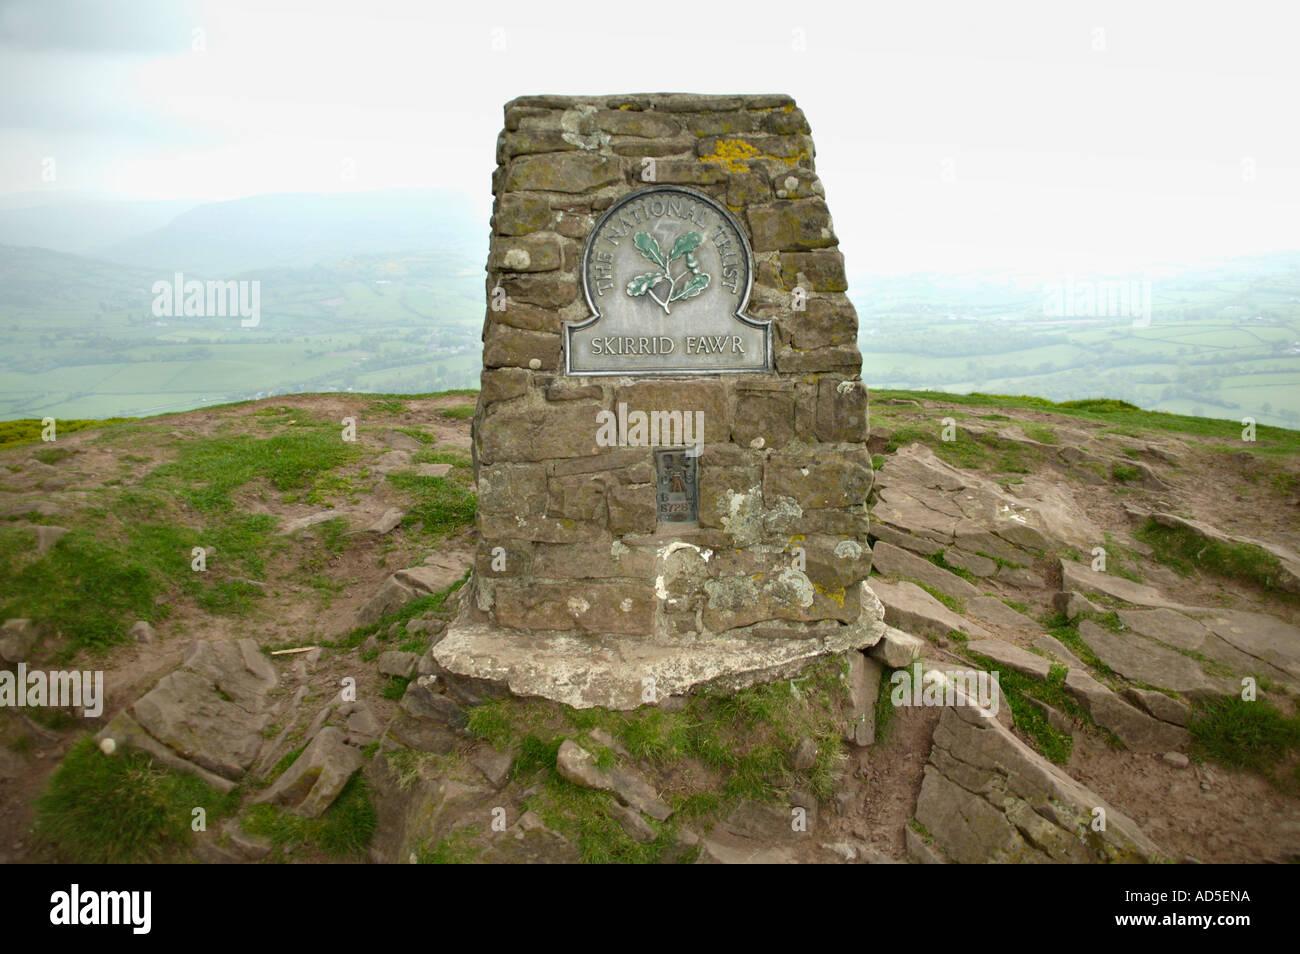 Summit of Skirrid Fawr the Holy Mountain near Abergavenny Stock Photo: 7606233 - Alamy